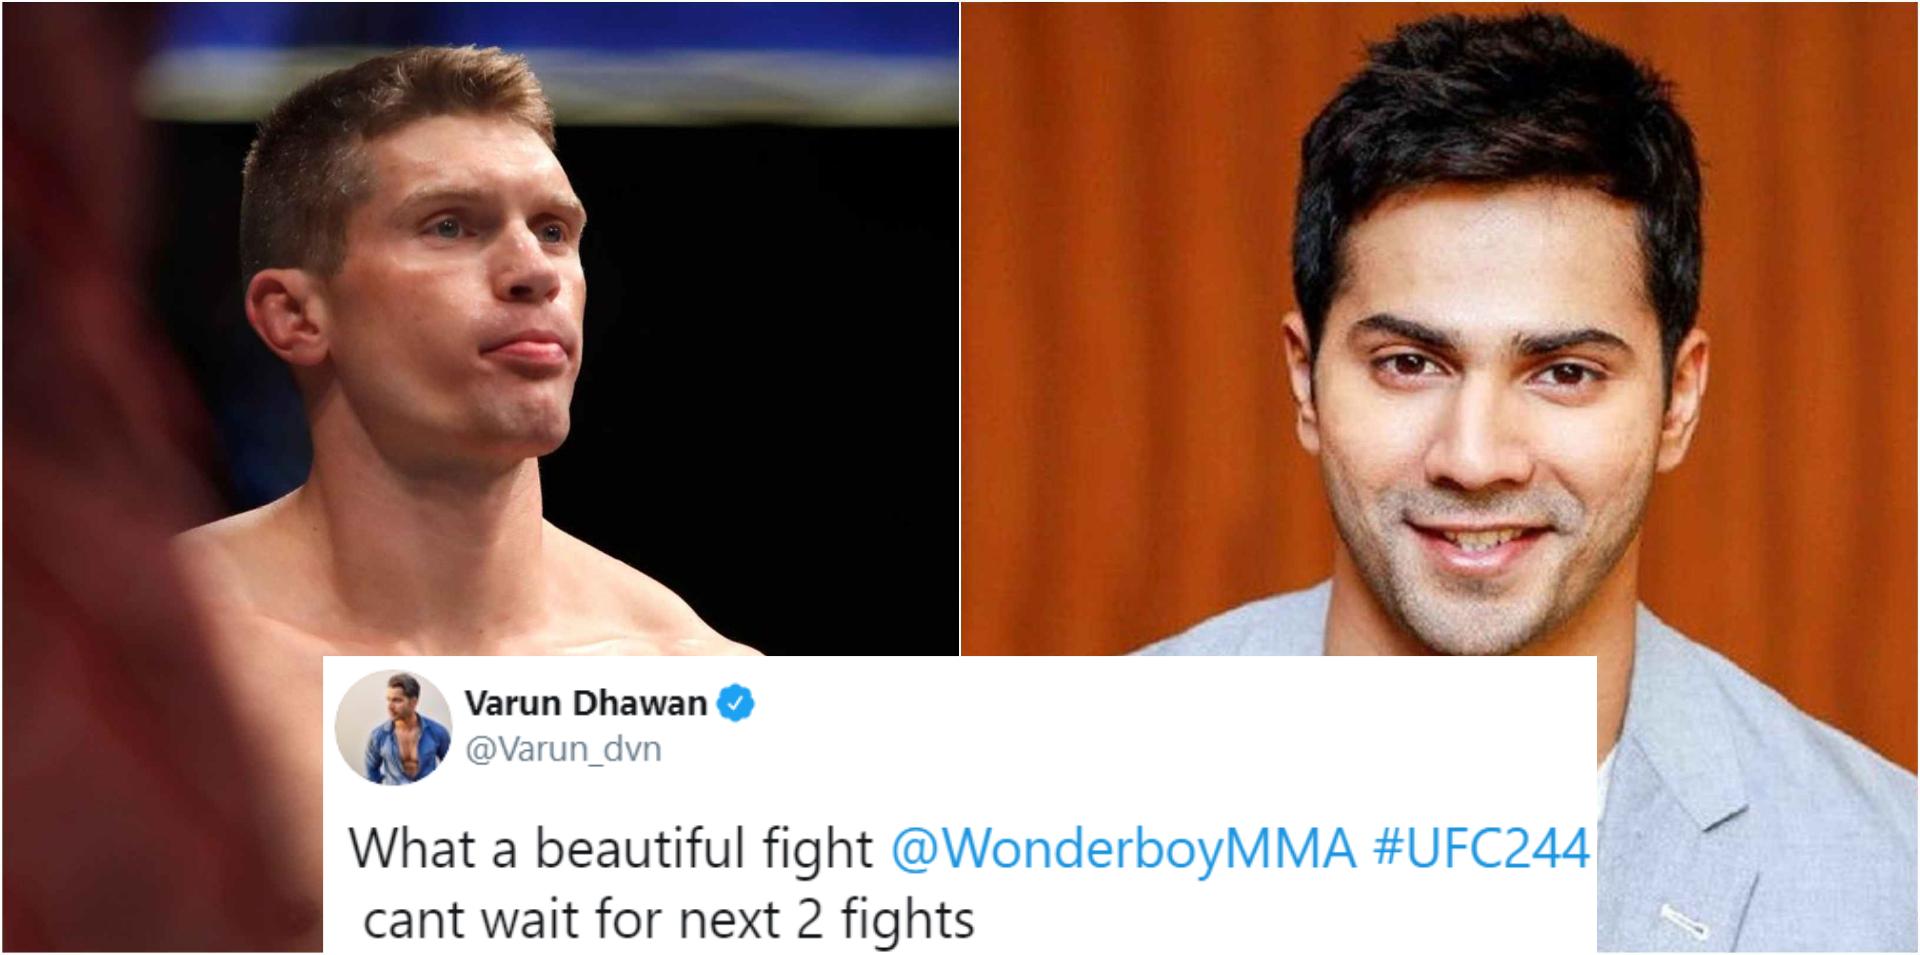 Stephen Thompson replies to Varun Dhawan congratulating him on his UFC 244 FOTN performance - UFC